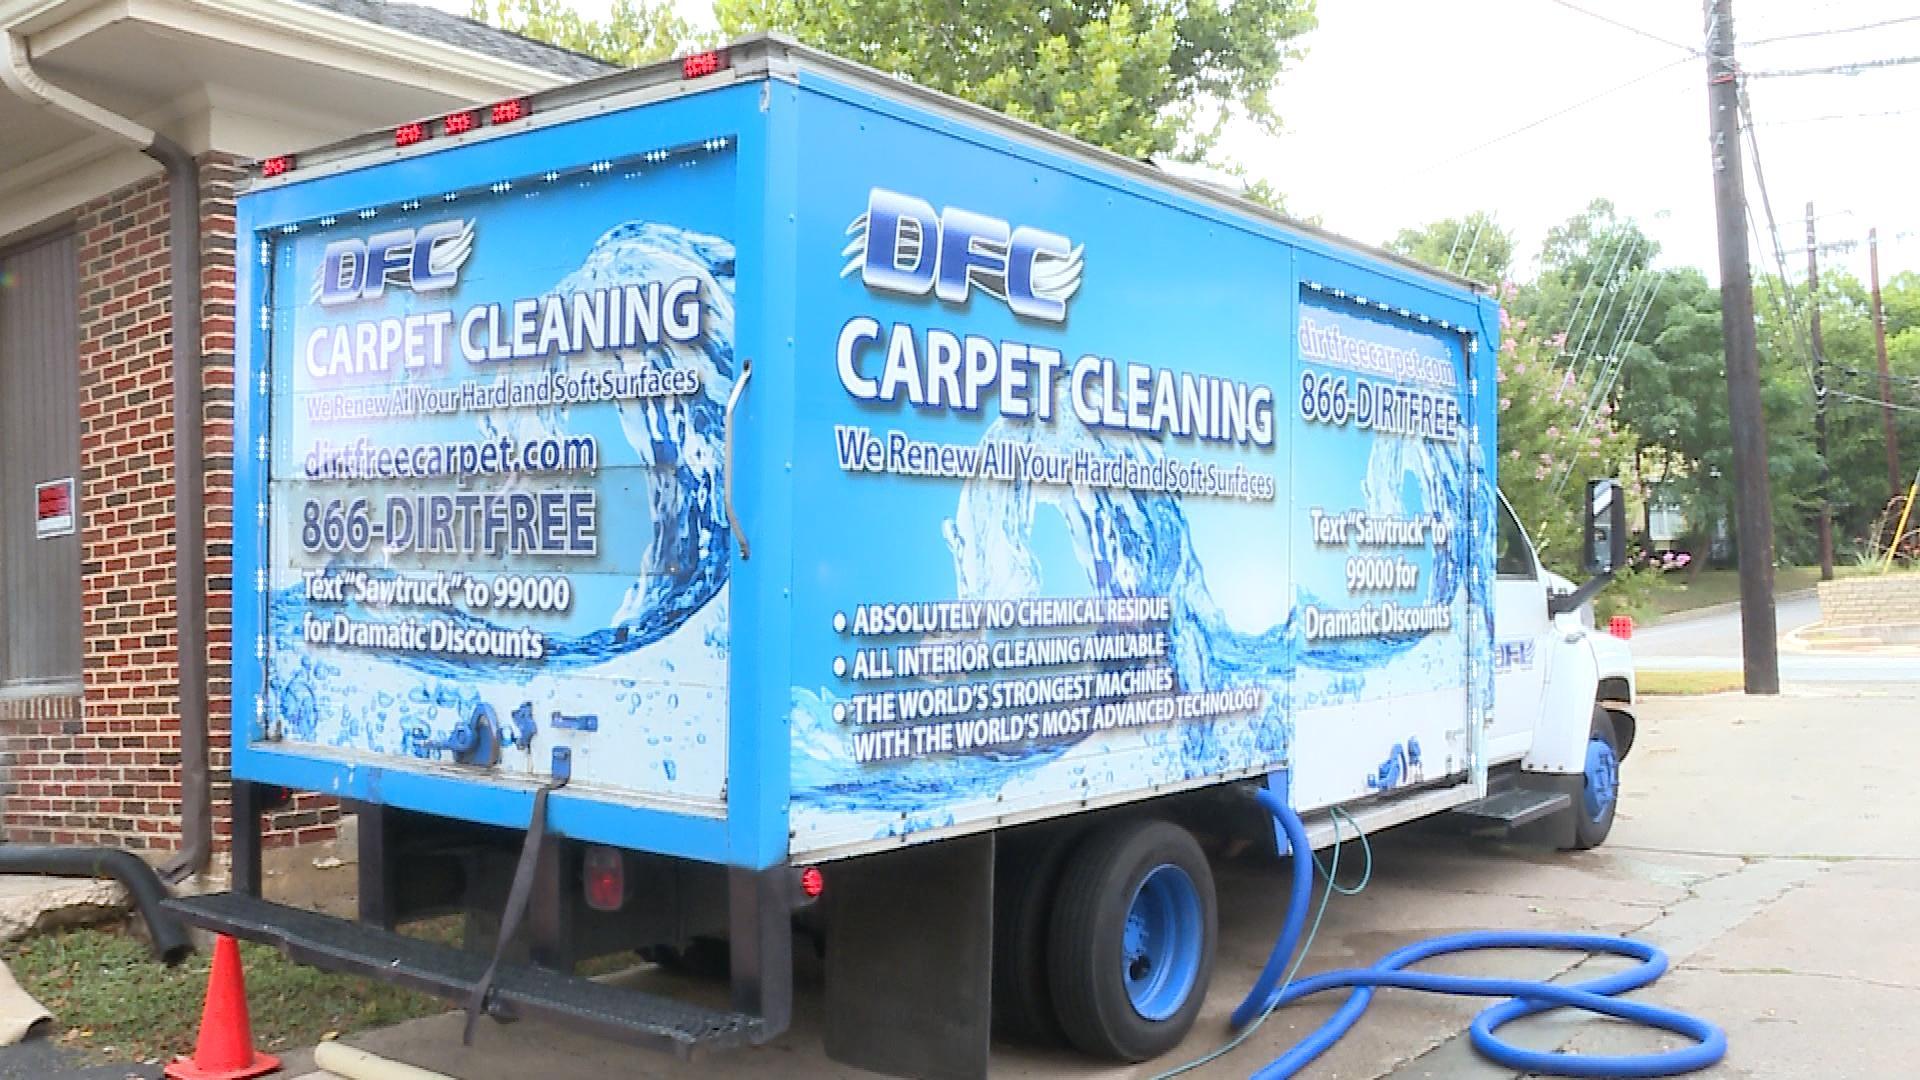 studio 512 dirt free carpet cleaning 1_631464